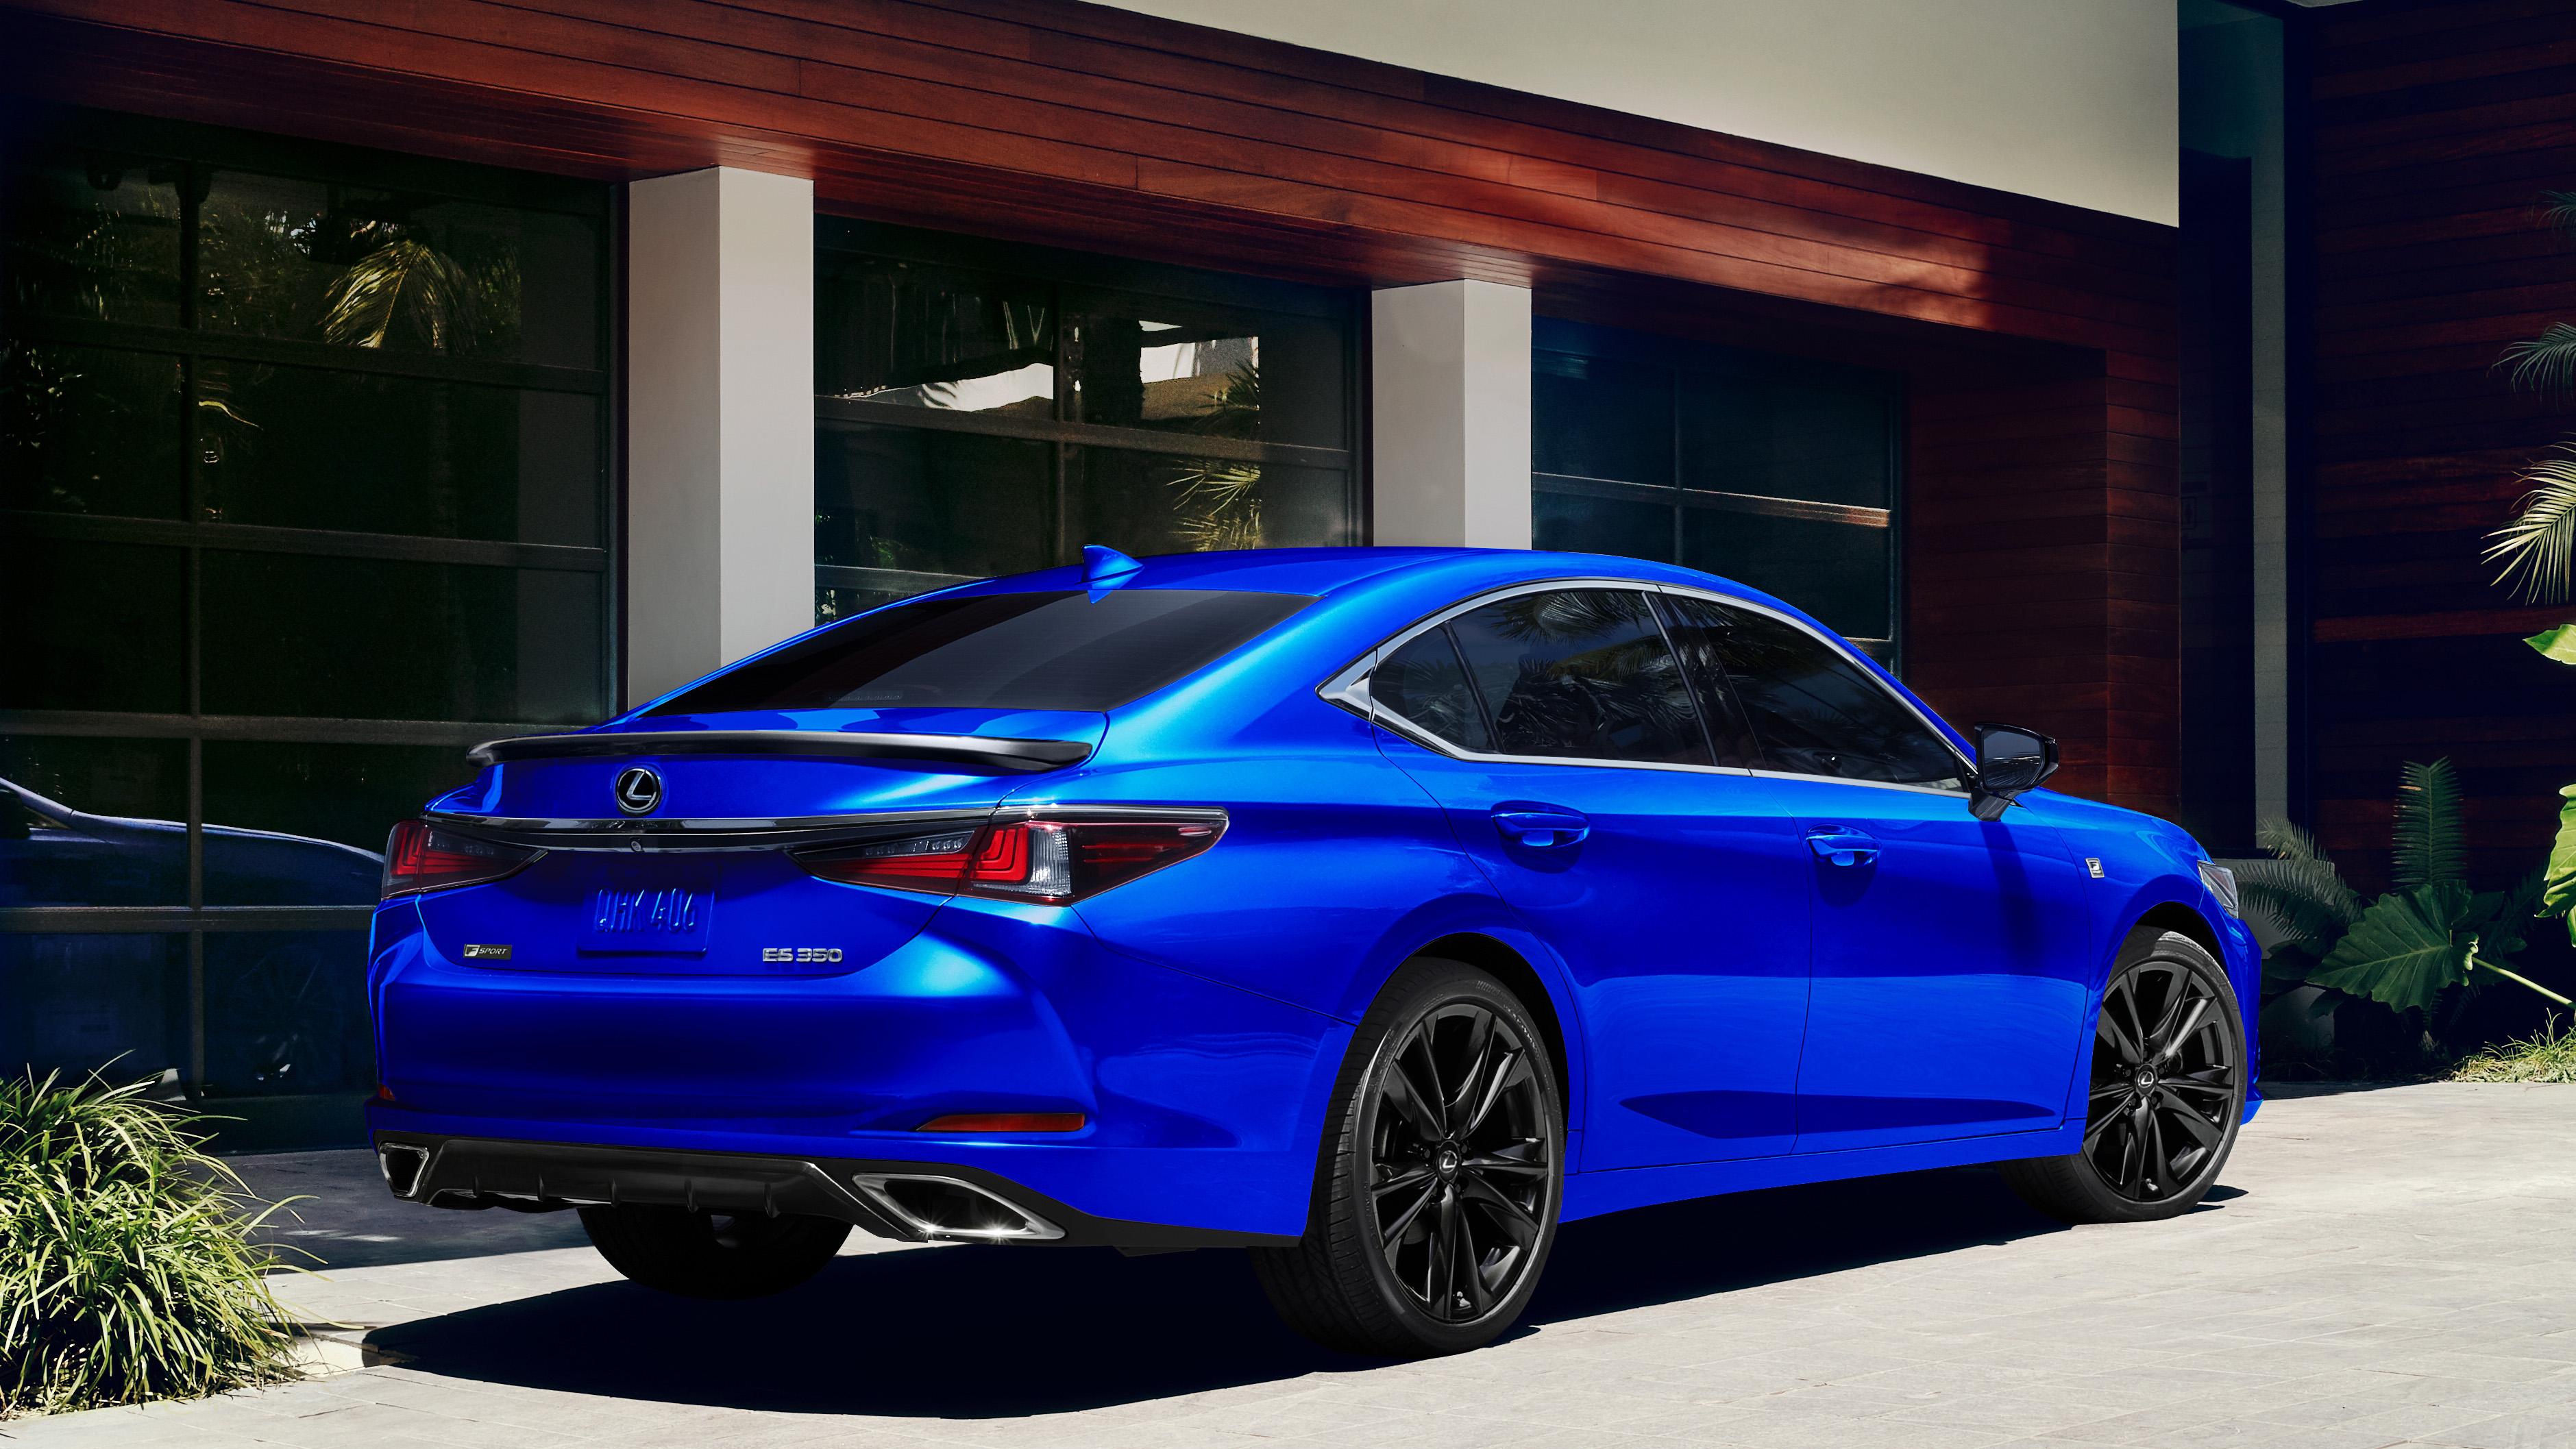 2021 Lexus ES 350 Spesification